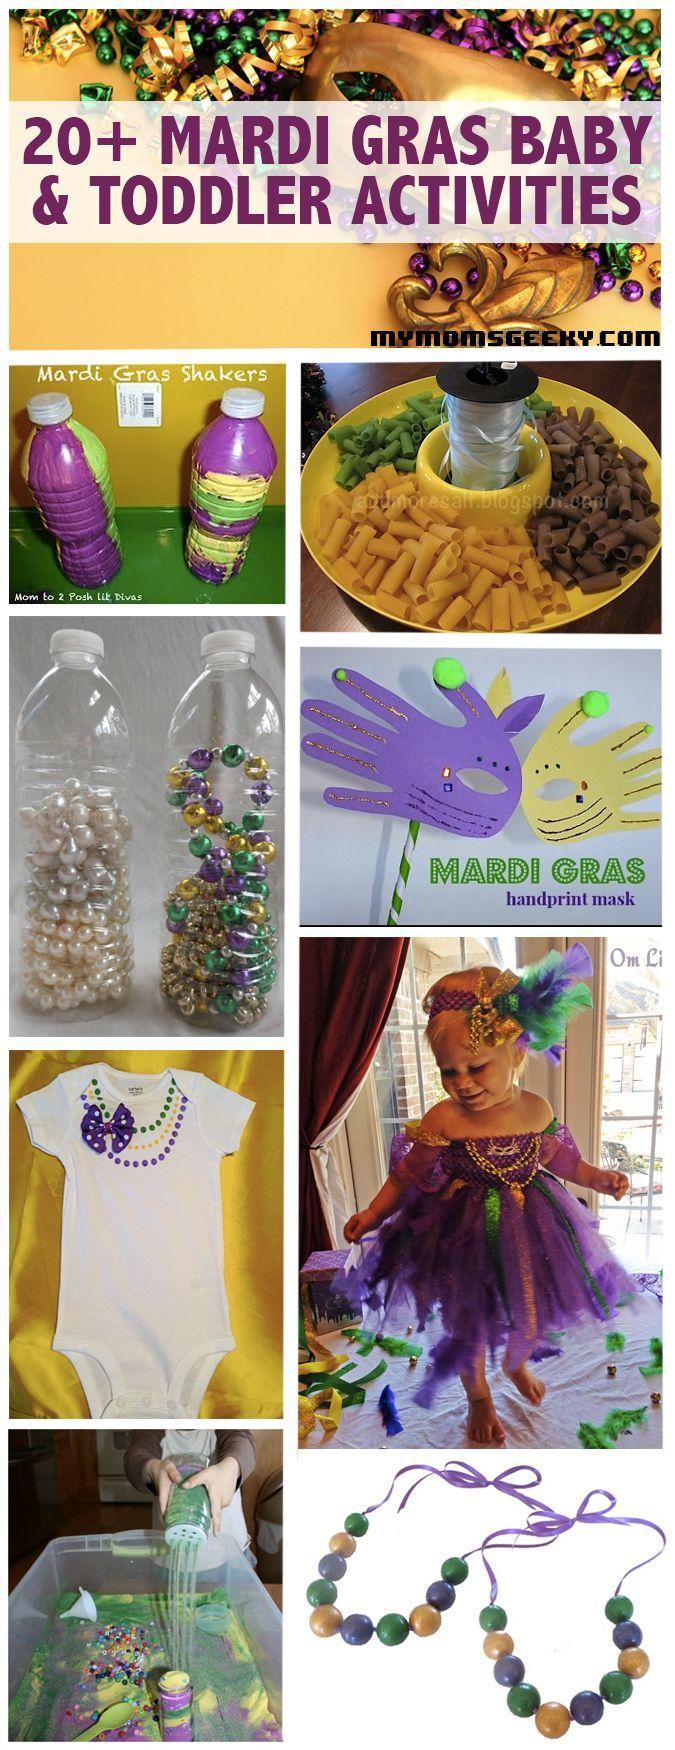 20 MARDI GRAS BABY  TODDLER ACTIVITIES 20 MARDI GRAS BABY  TODDLER ACTIVITIES